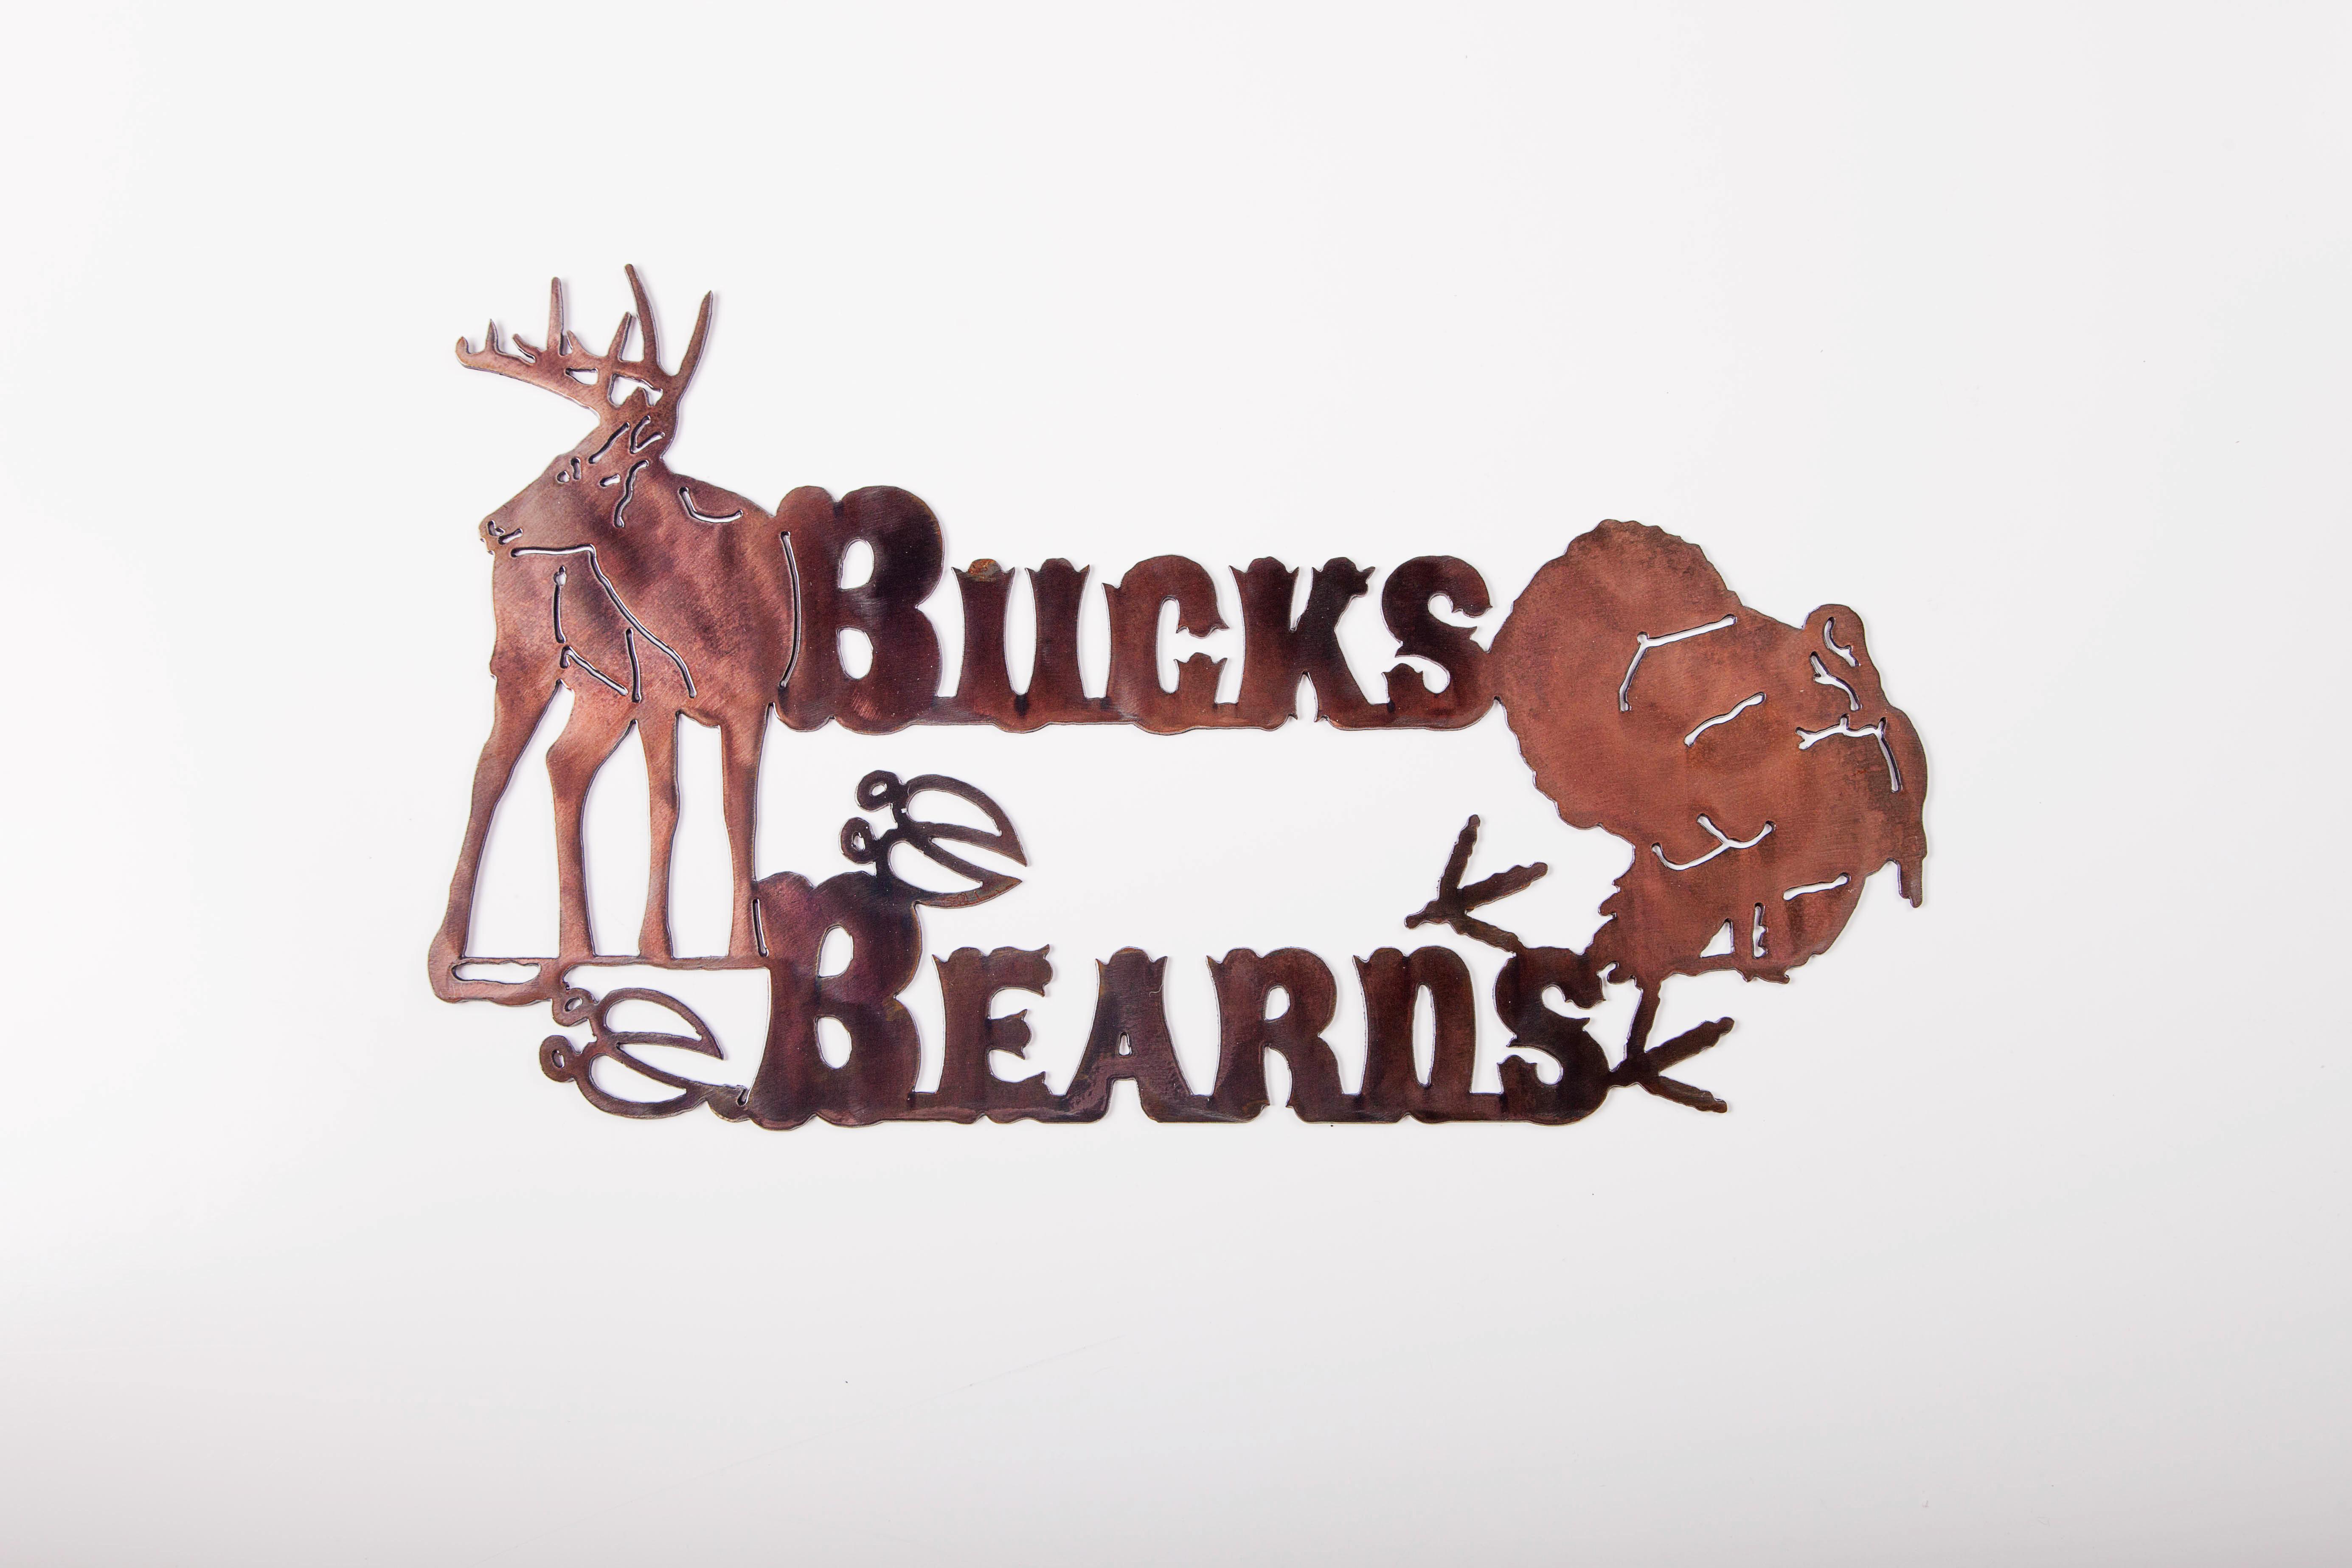 Bucks and Beards